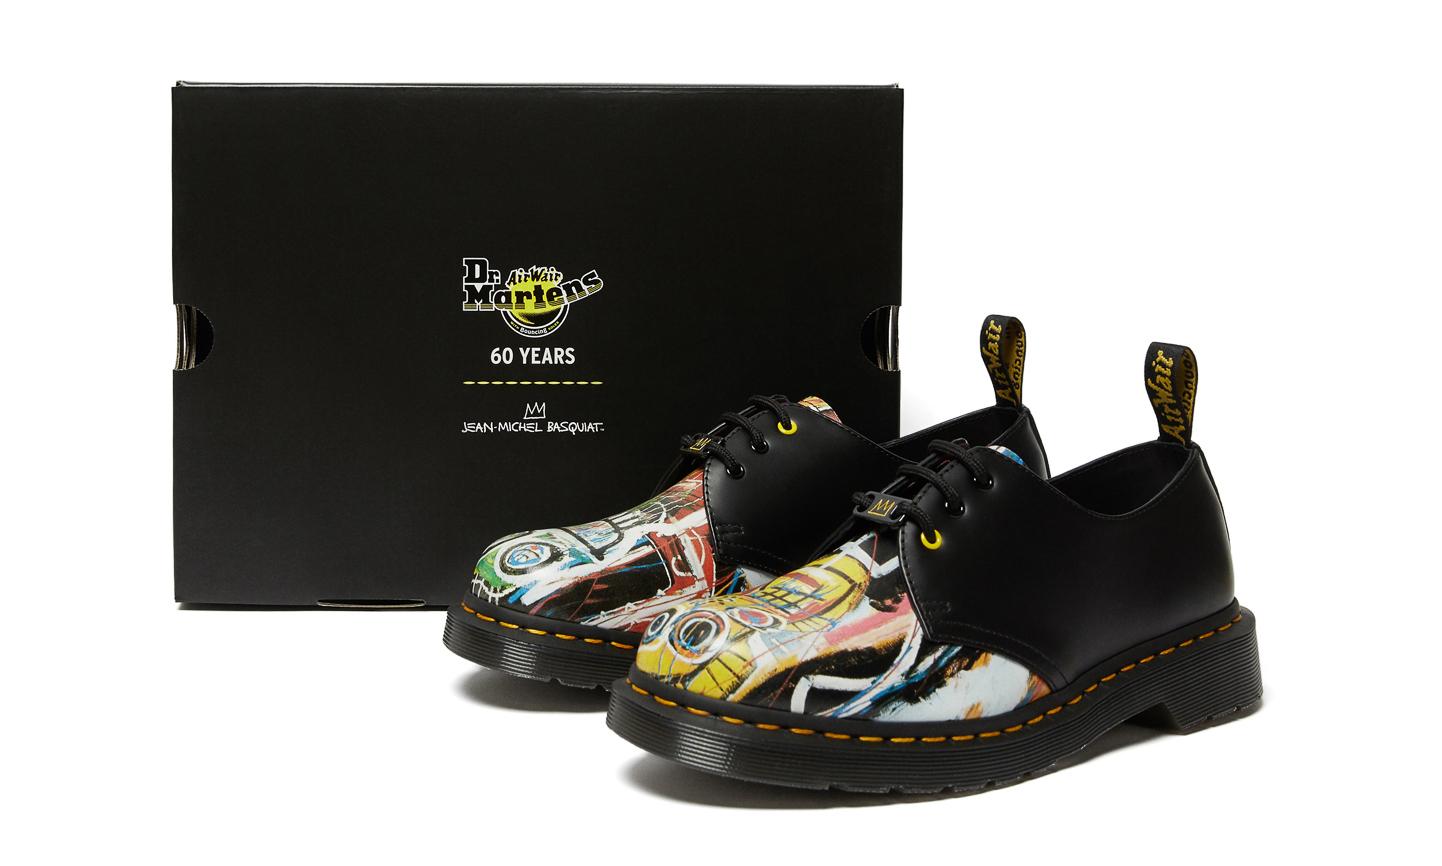 Dr.Martens x Jean-Michel Basquiat 联名鞋履即将释出